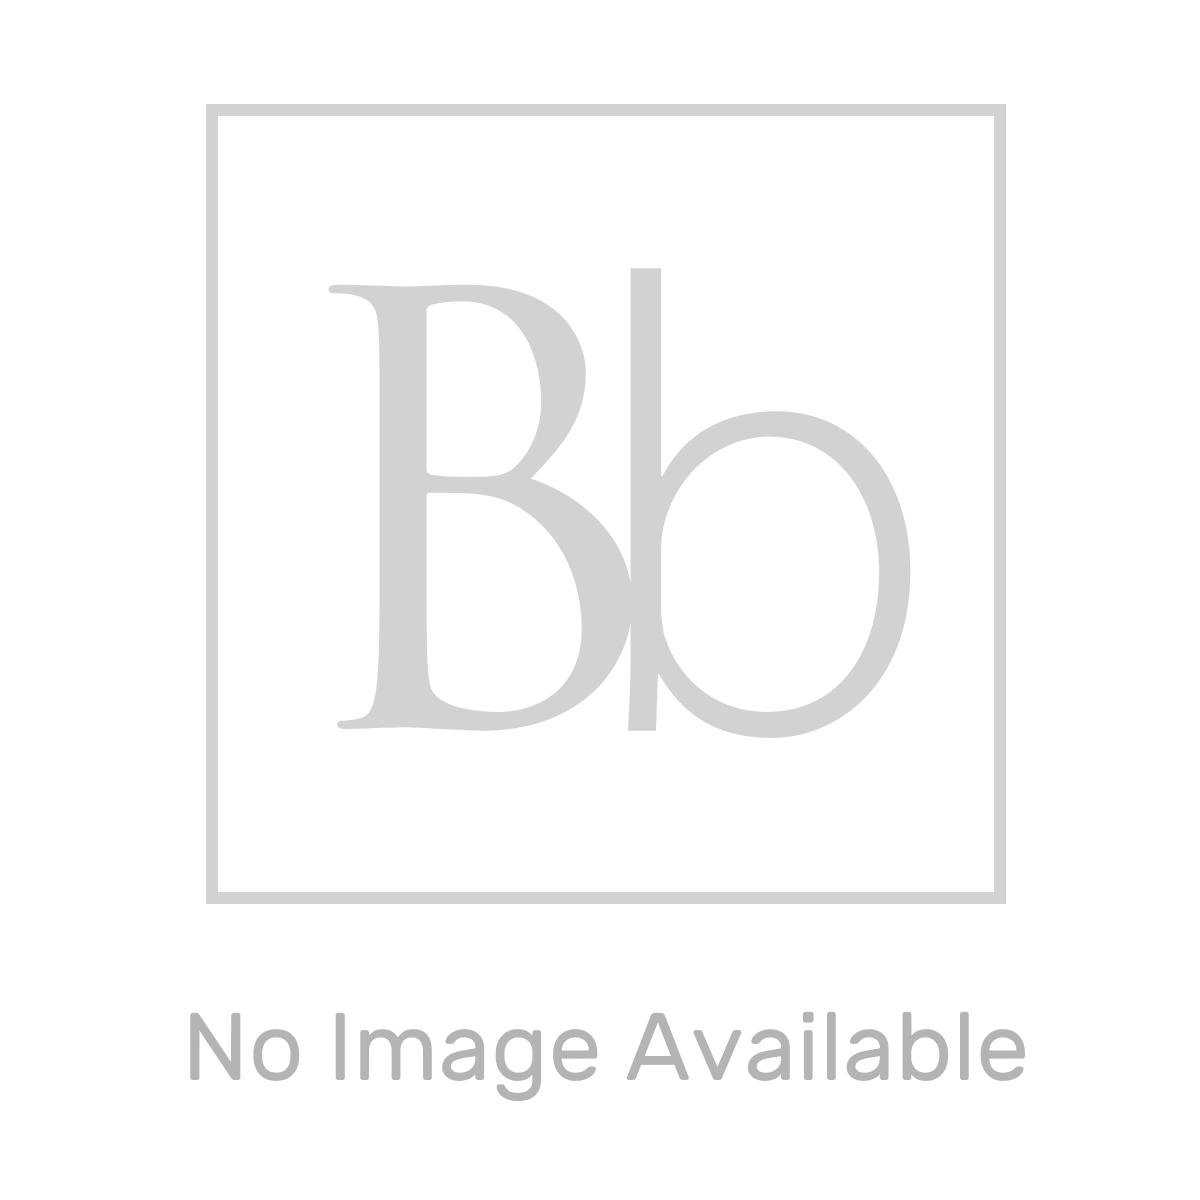 Stuart Turner 46503 Showermate Eco Standard Single 2.0 Bar Pump Back